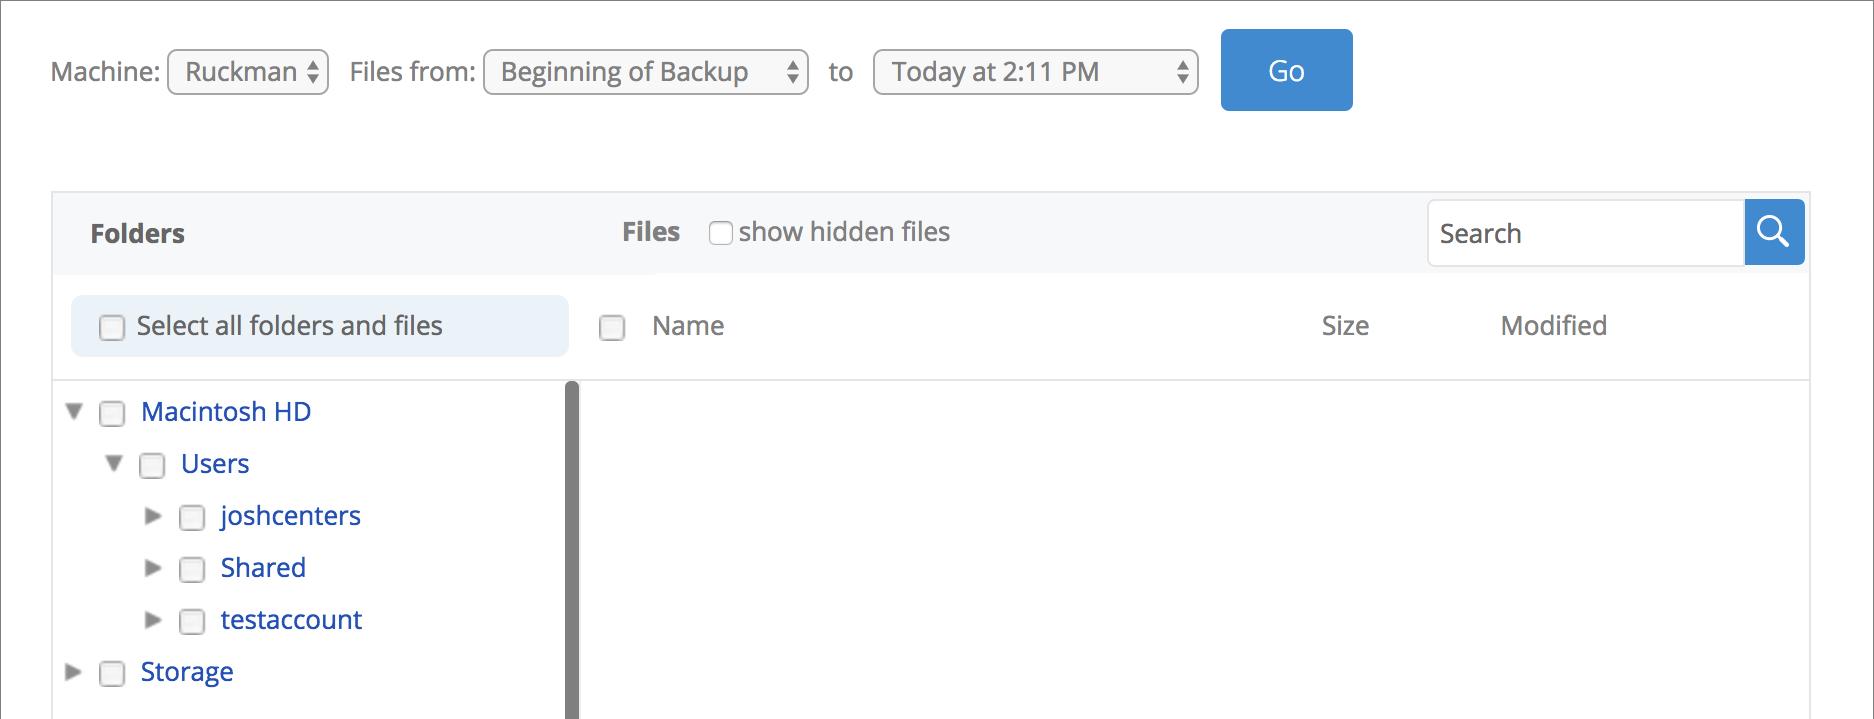 How to Restore Files from Backblaze - TidBITS